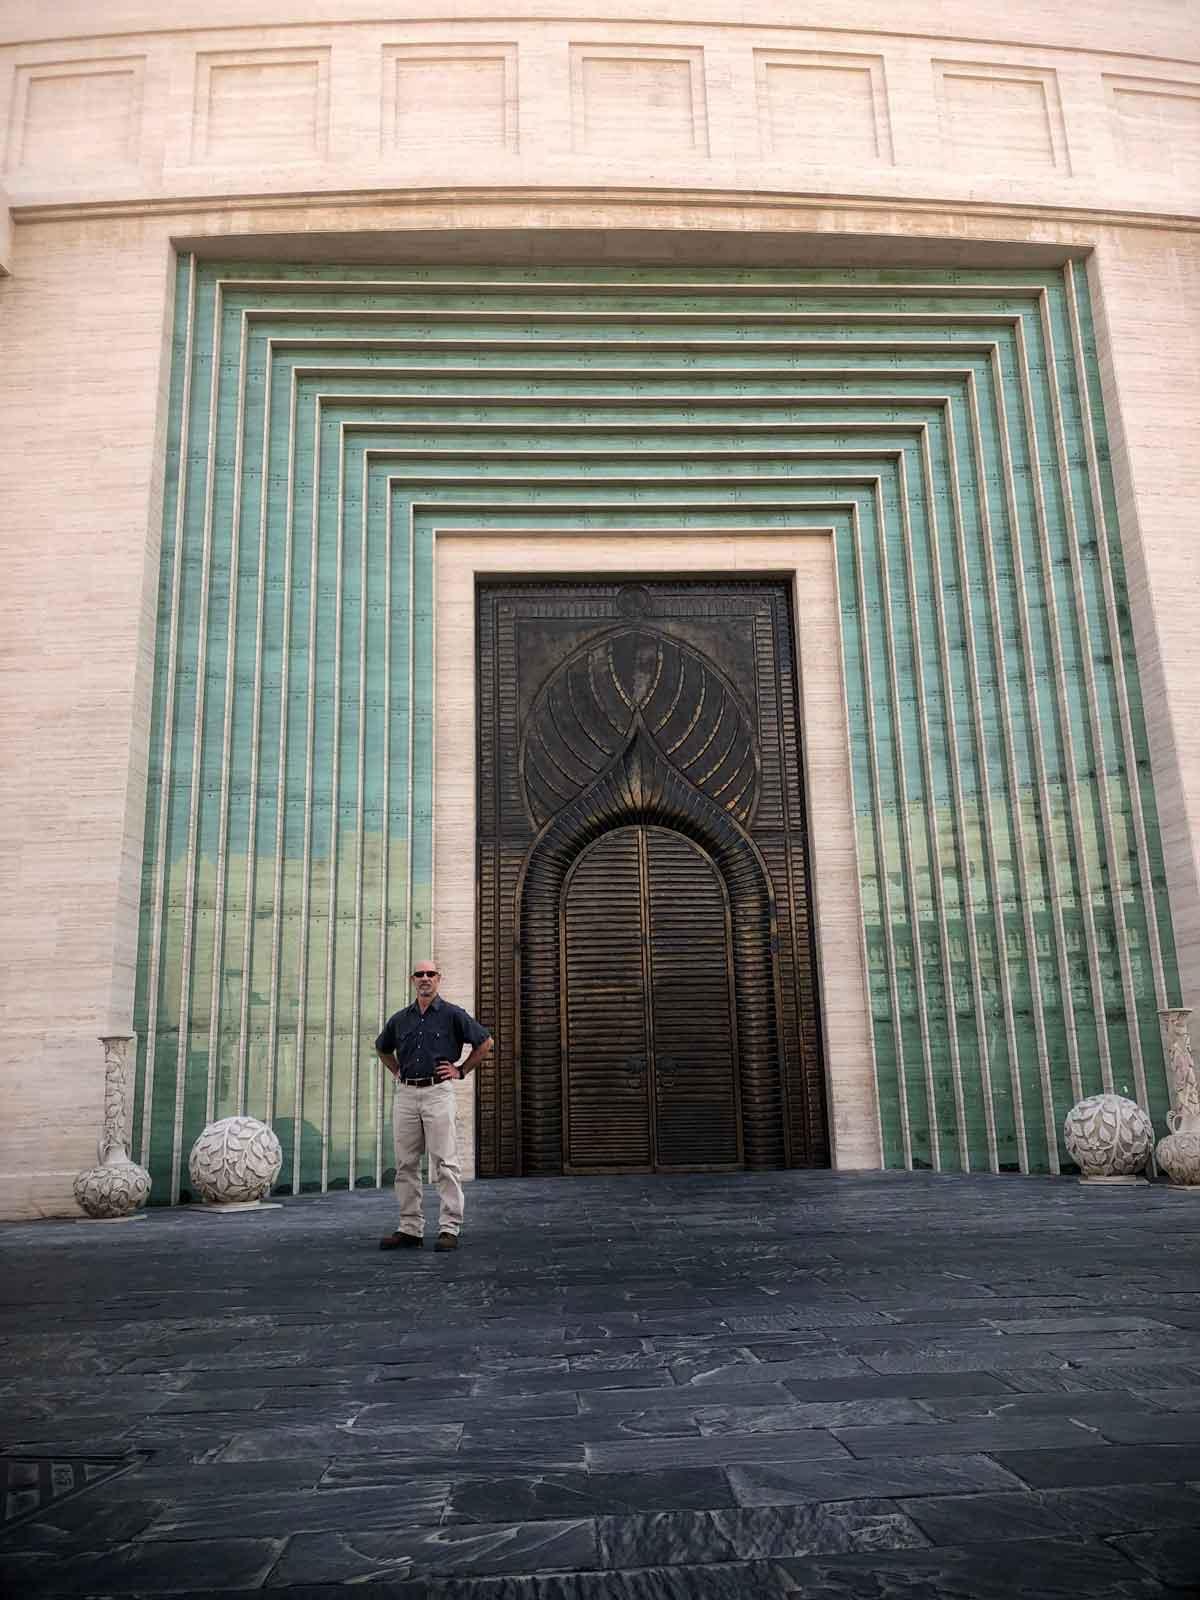 A gigantic doorway at the Katara Cultural Village.